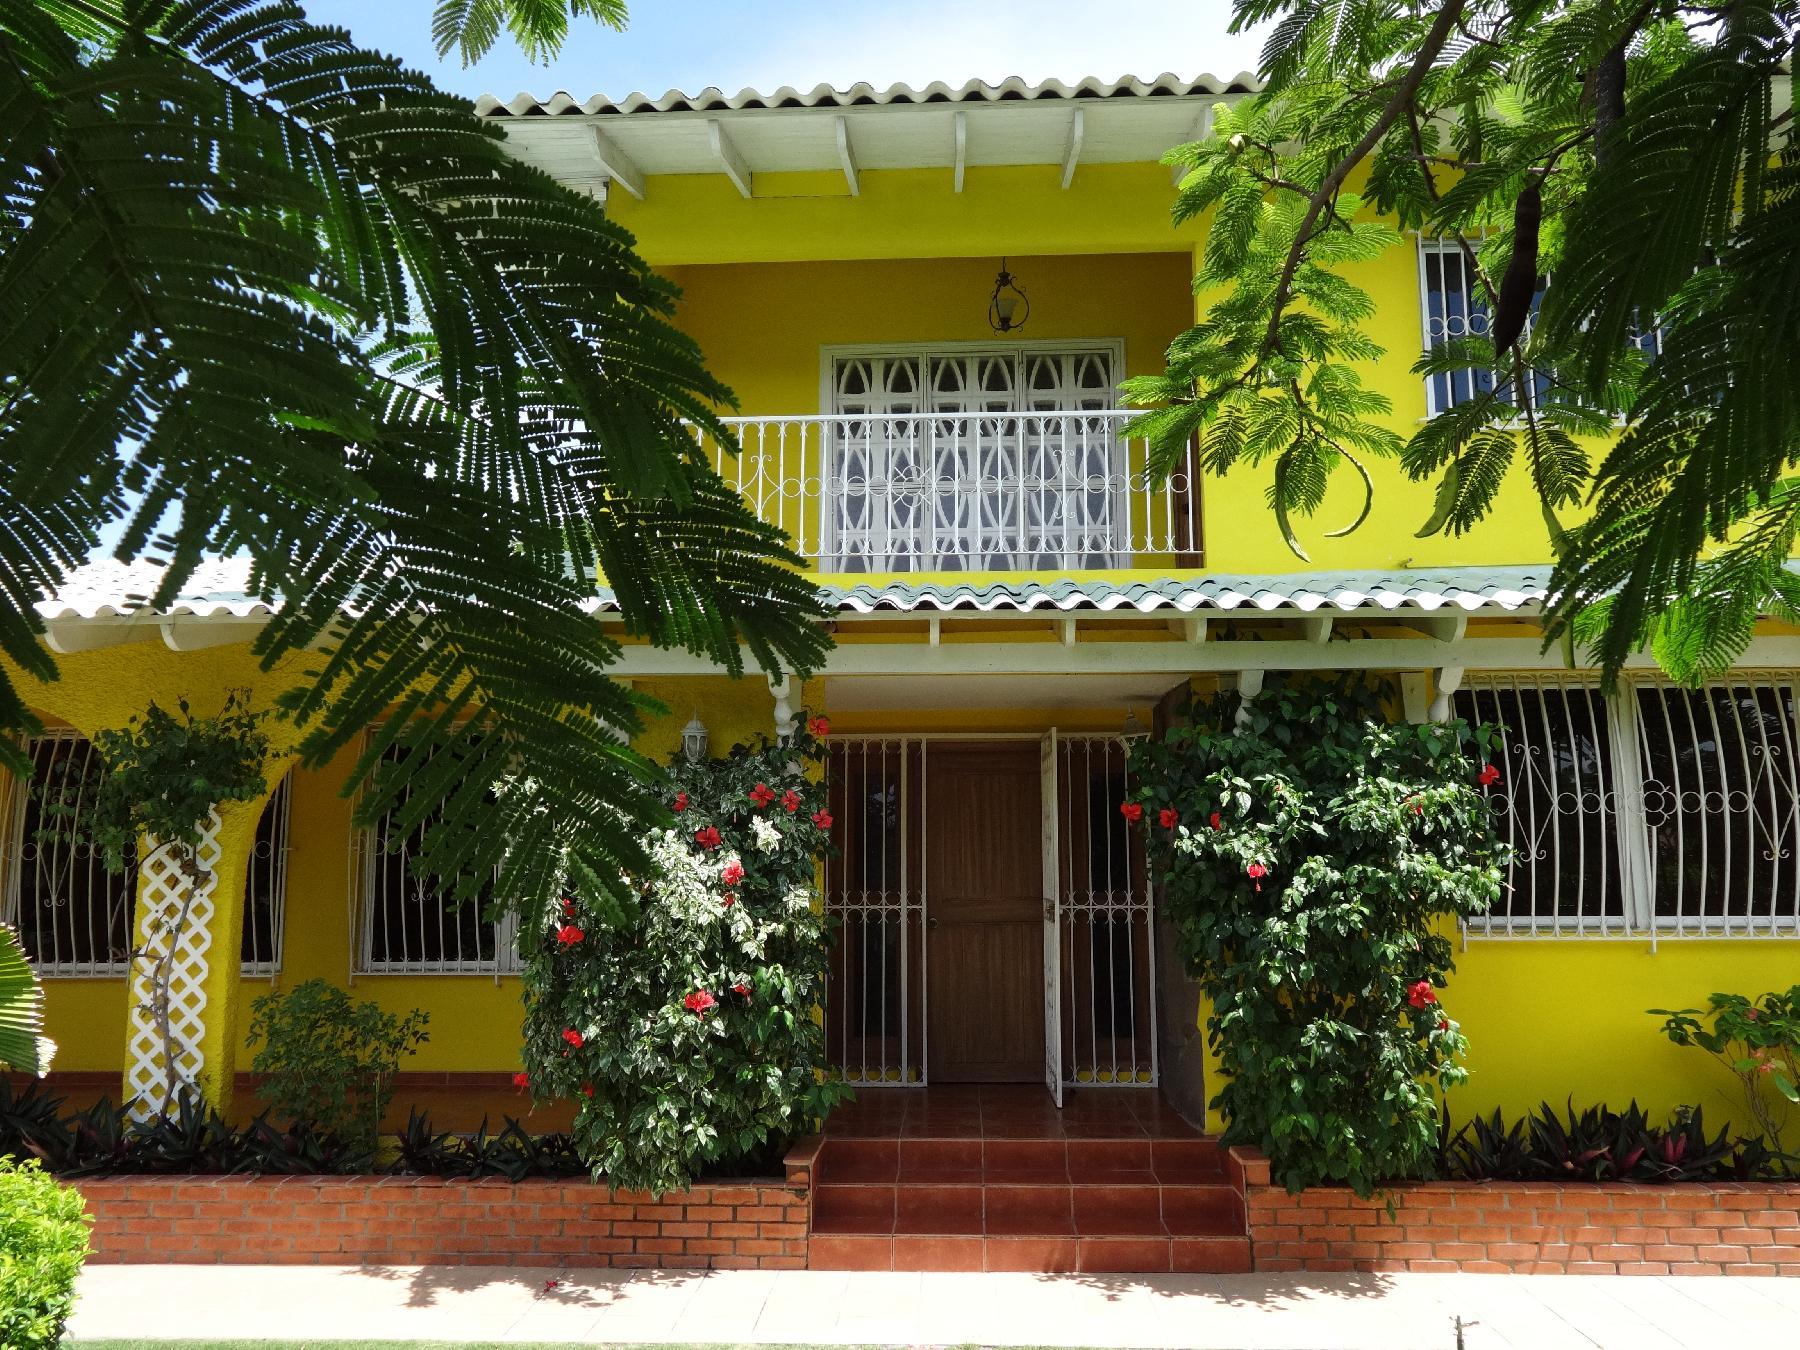 Panama punta chame hostal casa amarilla for Hostal casa amarilla